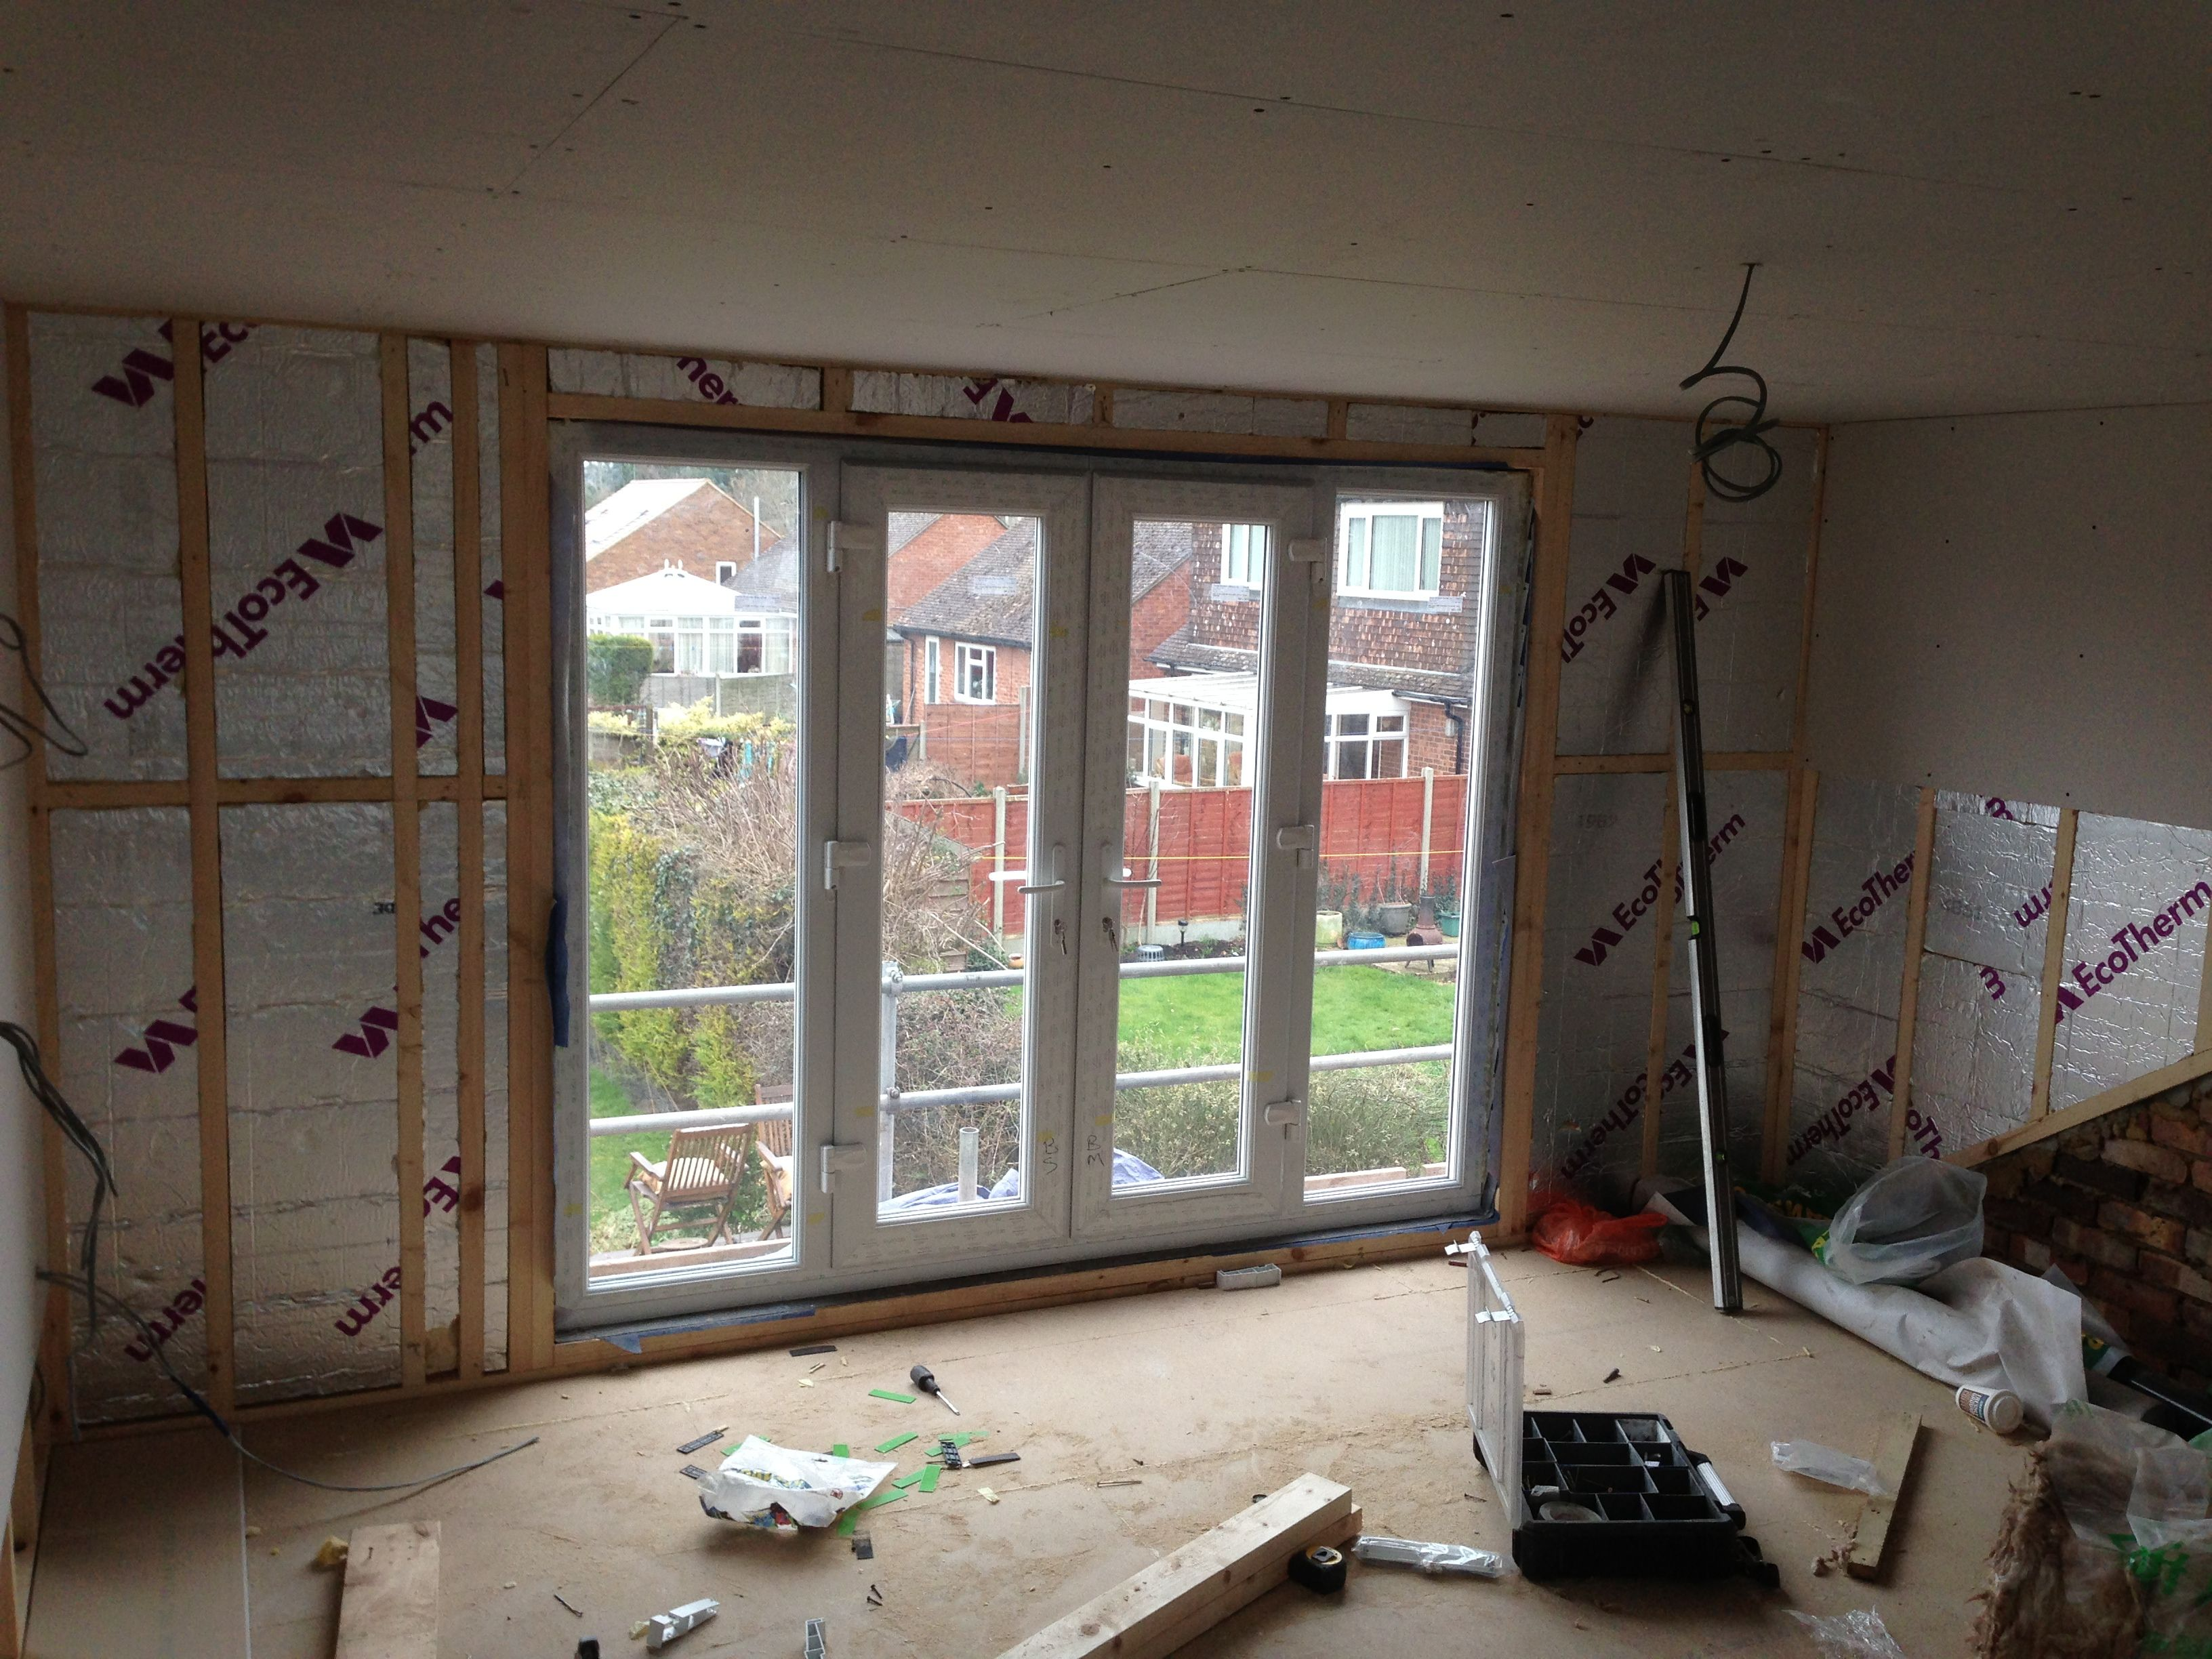 Balcony french doors - French Doors Juliette Balcony Loft Conversion